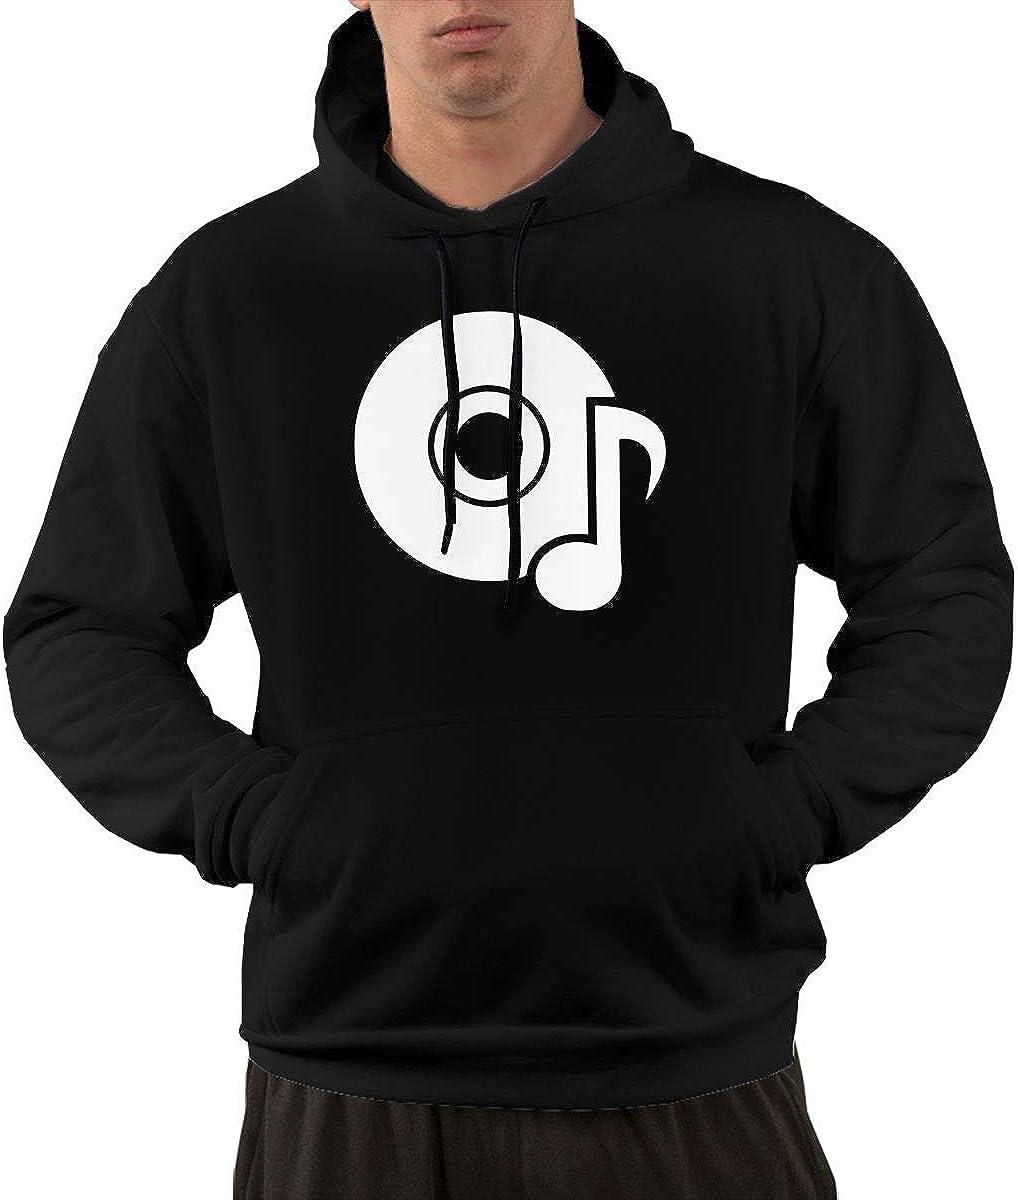 thegymyarraville.com.au Fashion Hoodies & Sweatshirts Clothing ...